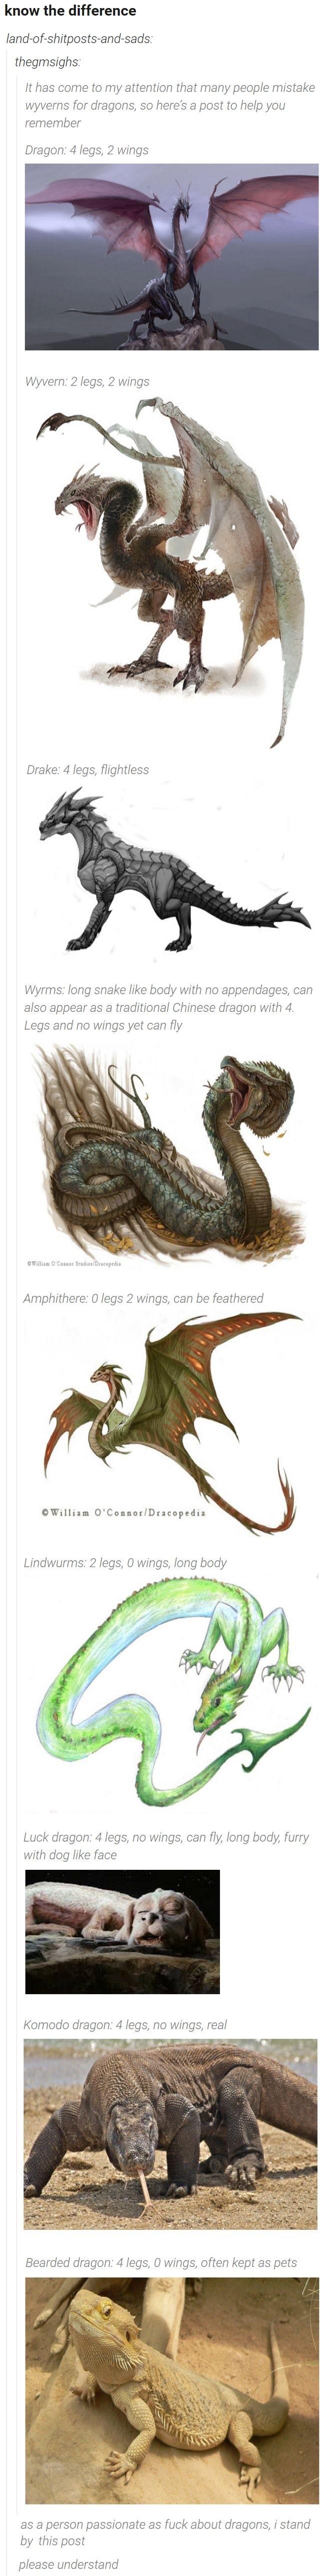 dragonfuckers. .. Krayt dragon: 8 legs, 0 wings, sand everywhere, you're dragonfuckers Krayt dragon: 8 legs 0 wings sand everywhere you're